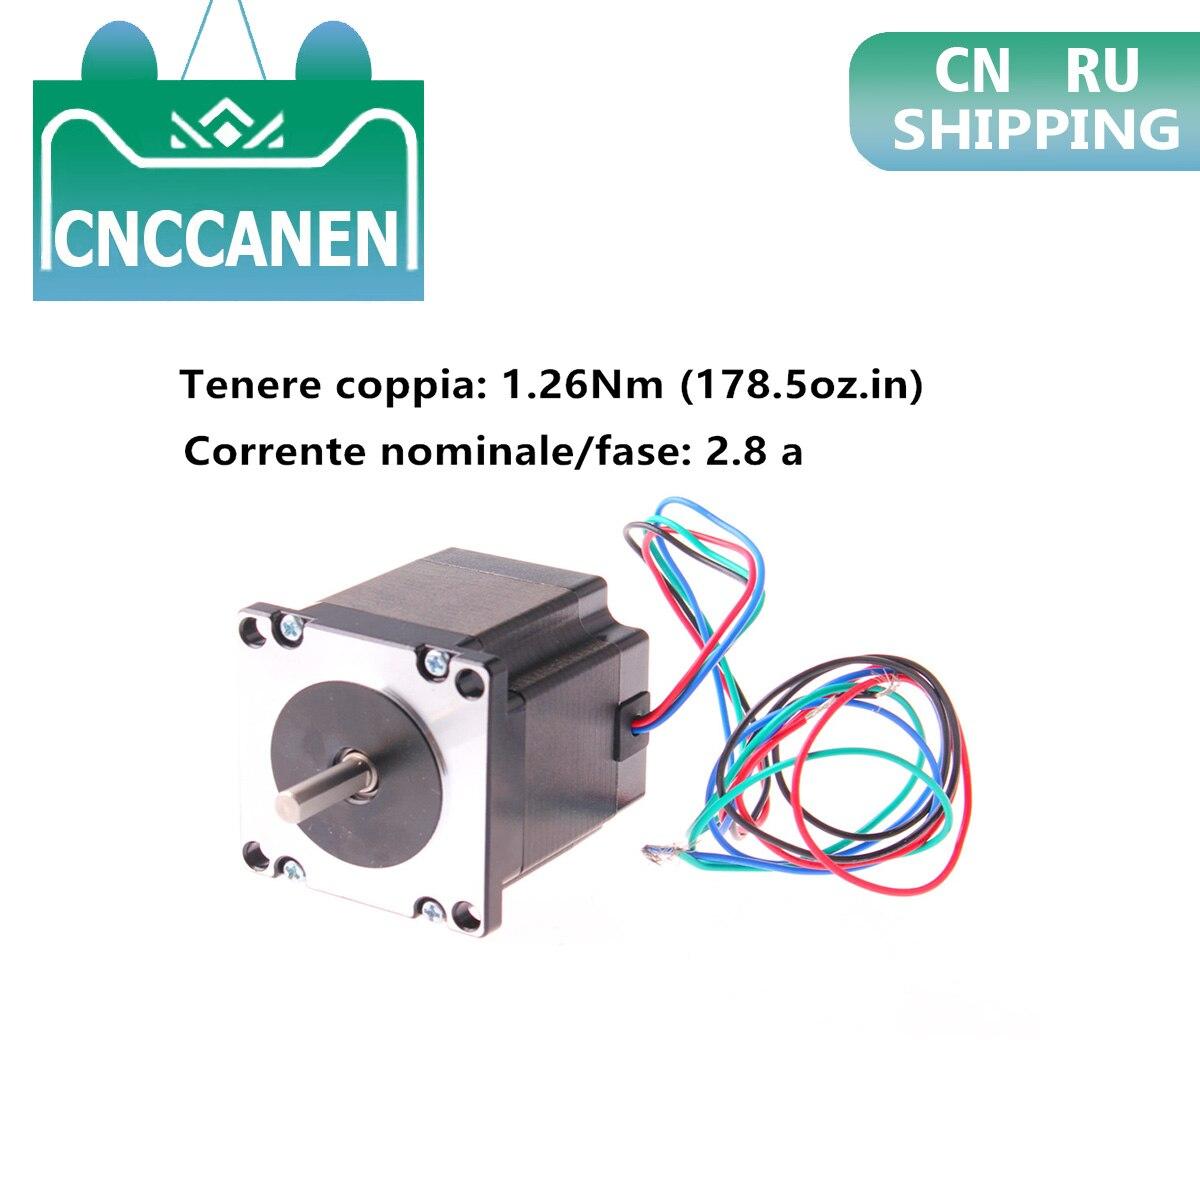 Nema 23 Motor de pasos 23HS22-2804S 179oz en (1.26Nm) 2,5 V 2.8A 1,8 ° 57*57*56mm para CNC 3D impresora